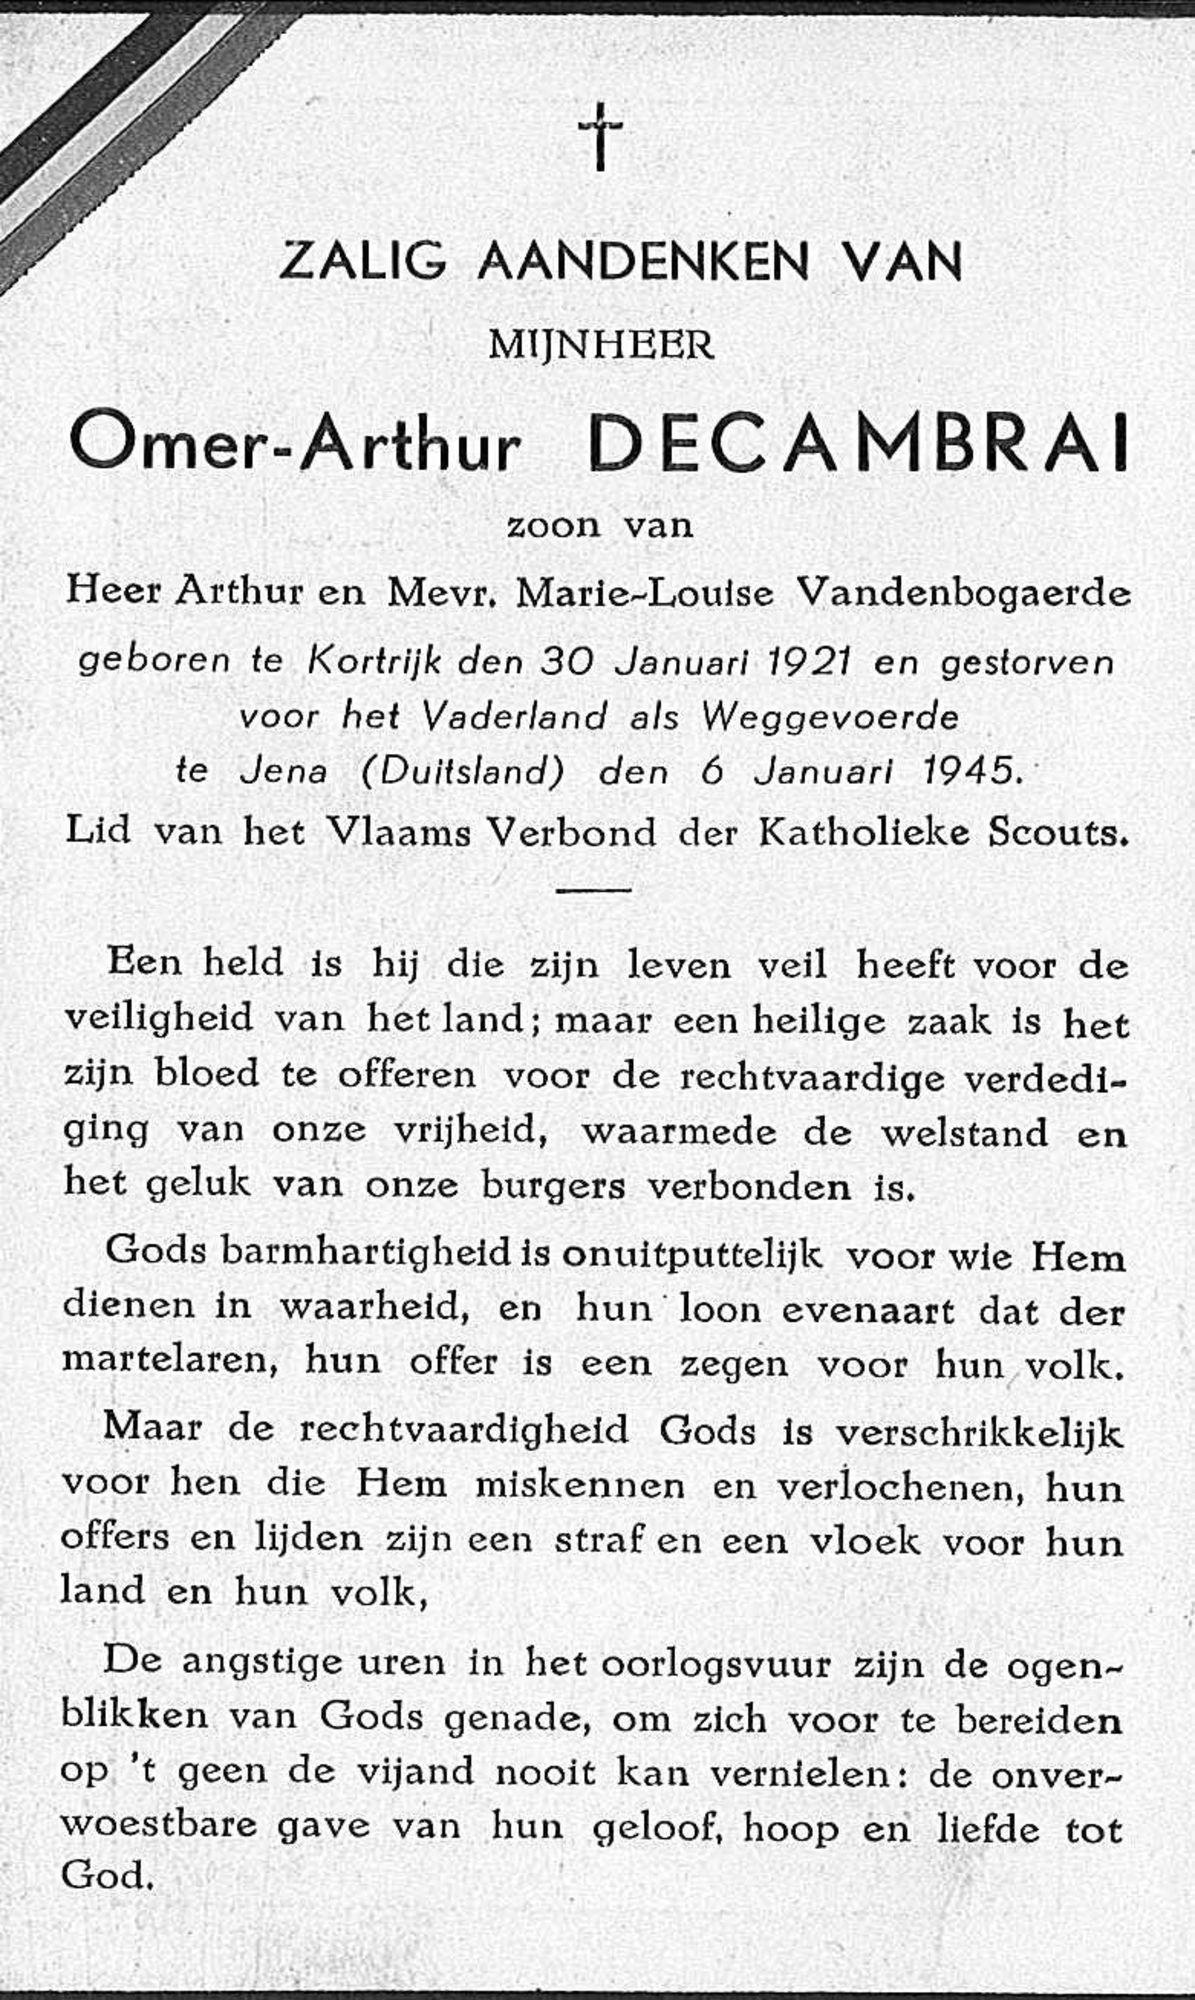 Omer-Arthur Decambrai